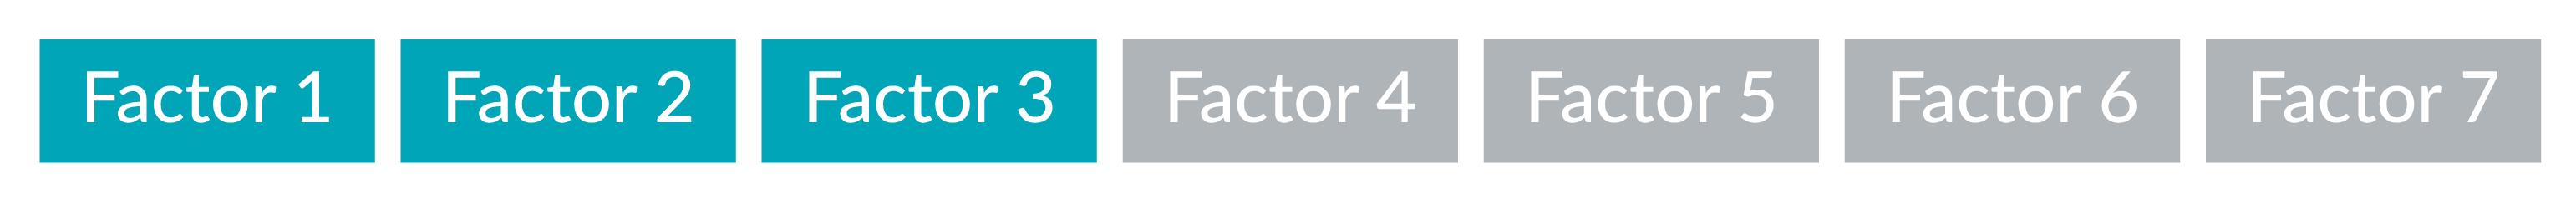 Exhibit 2: Selected Factors from Lasso Regression